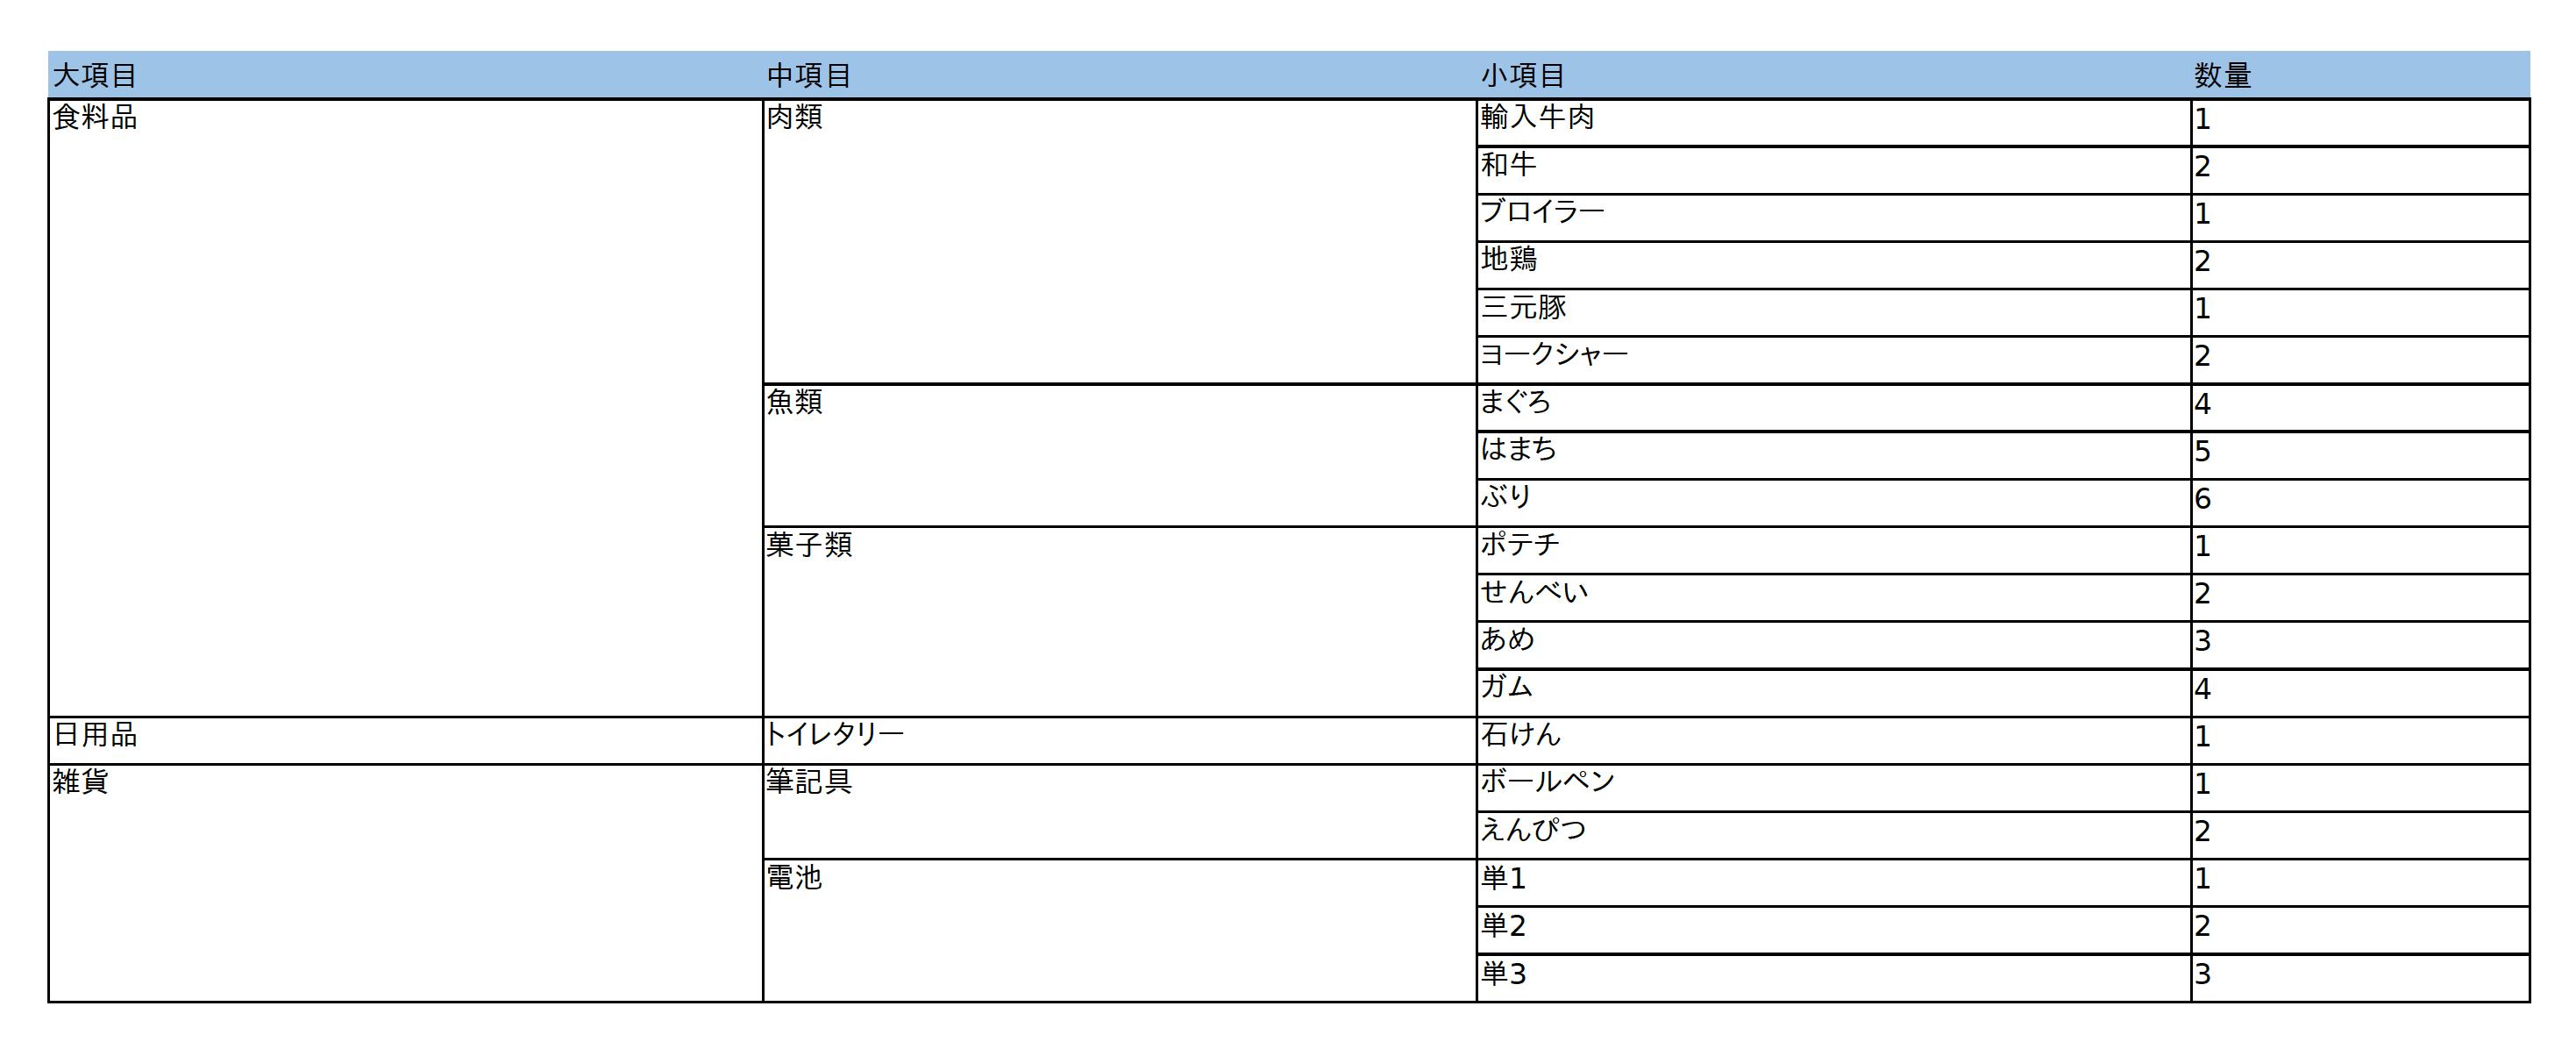 https://s3.ap-northeast-1.amazonaws.com/site.docurain.jp/blog/2020/11/スクリーンショット-2020-11-04-11.44.37.png